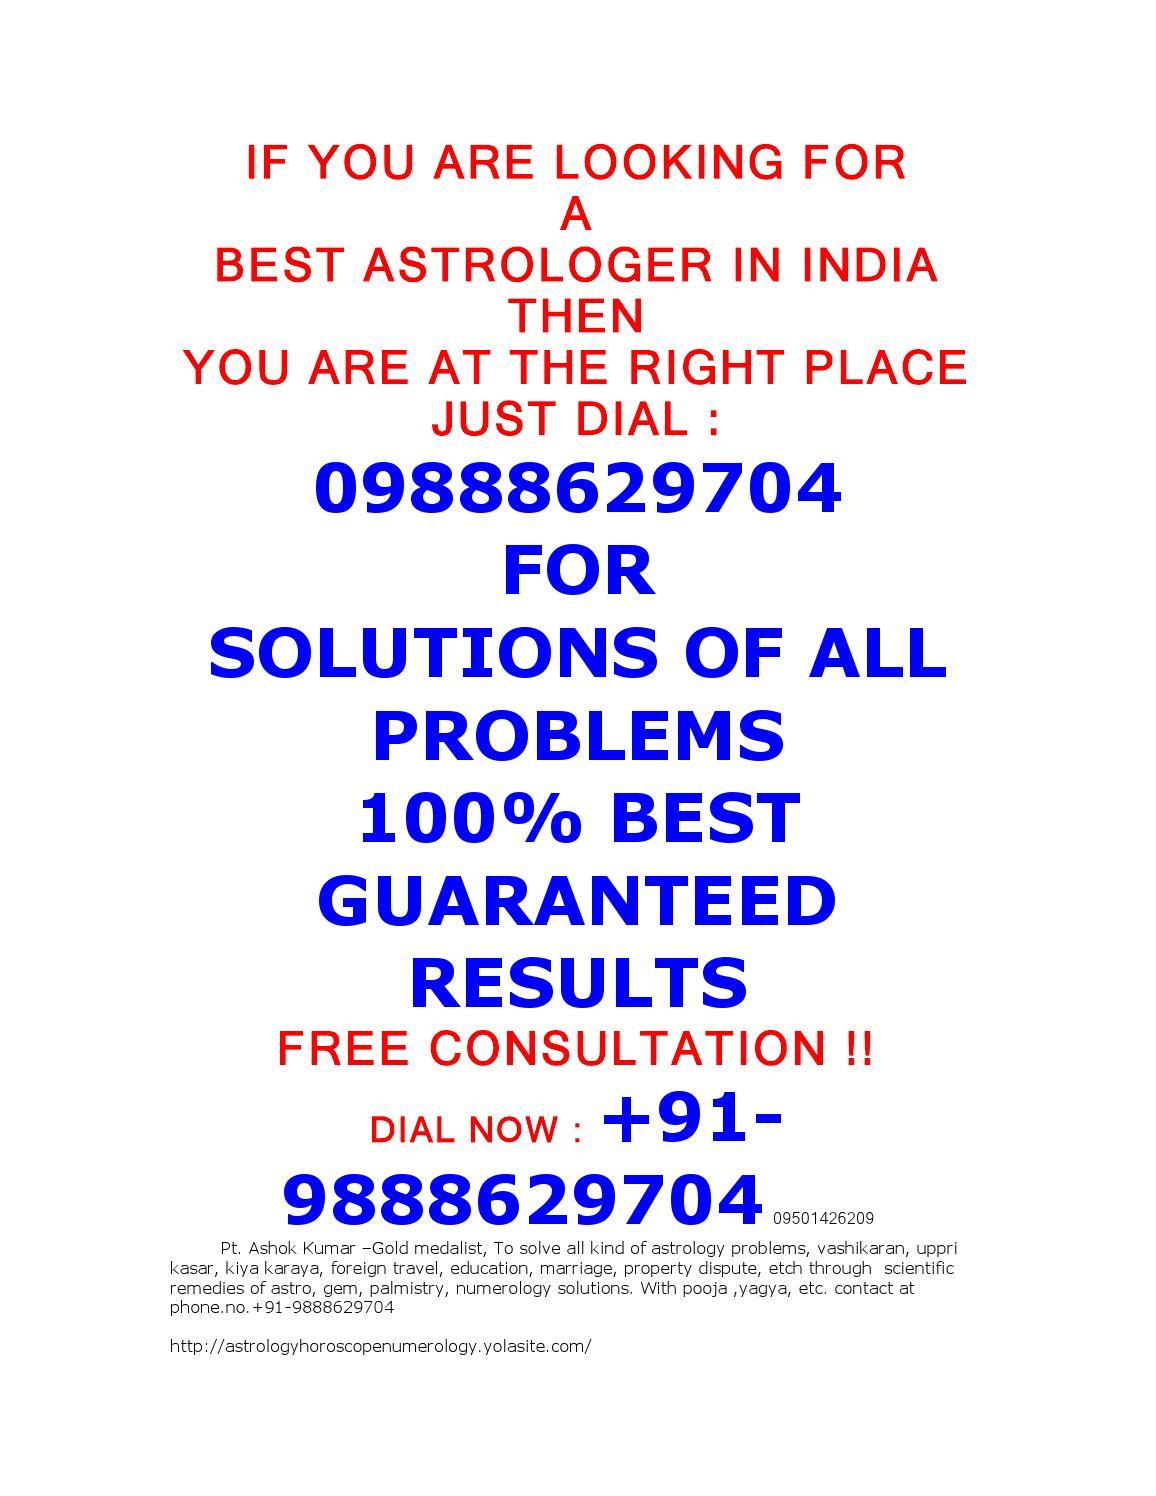 Free astrology on phone pandit ashok sharma real astrologer +